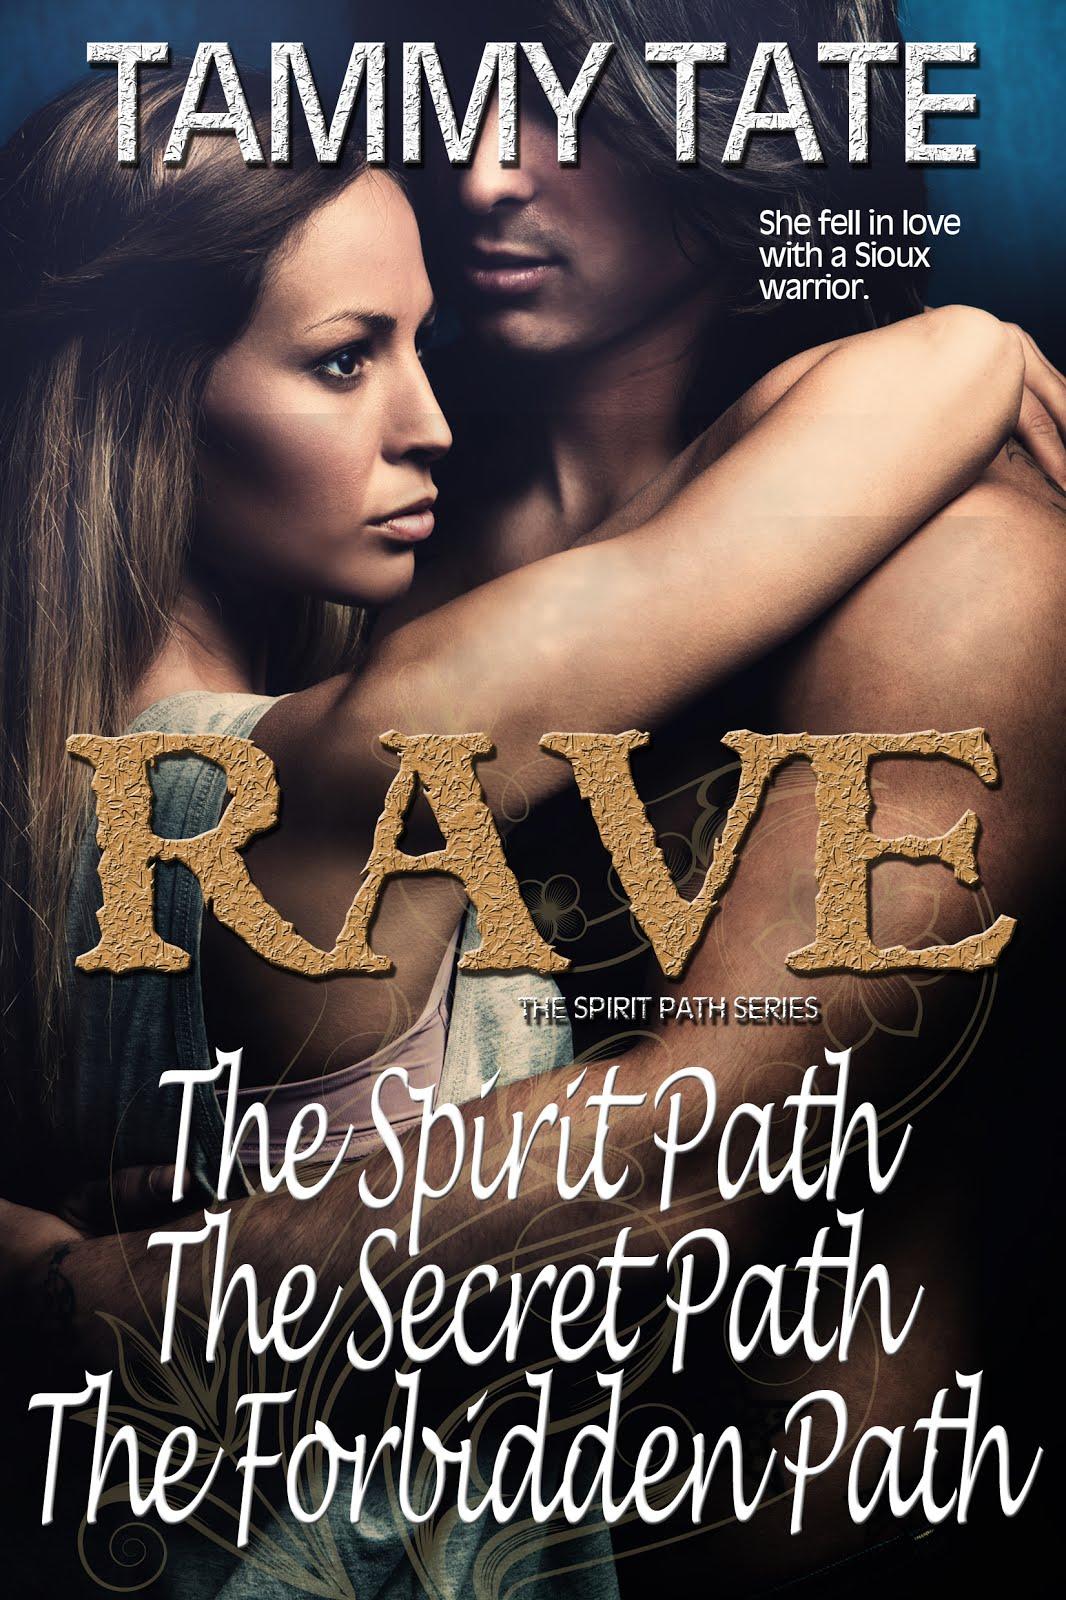 RAVE (The complete Spirit Path series)